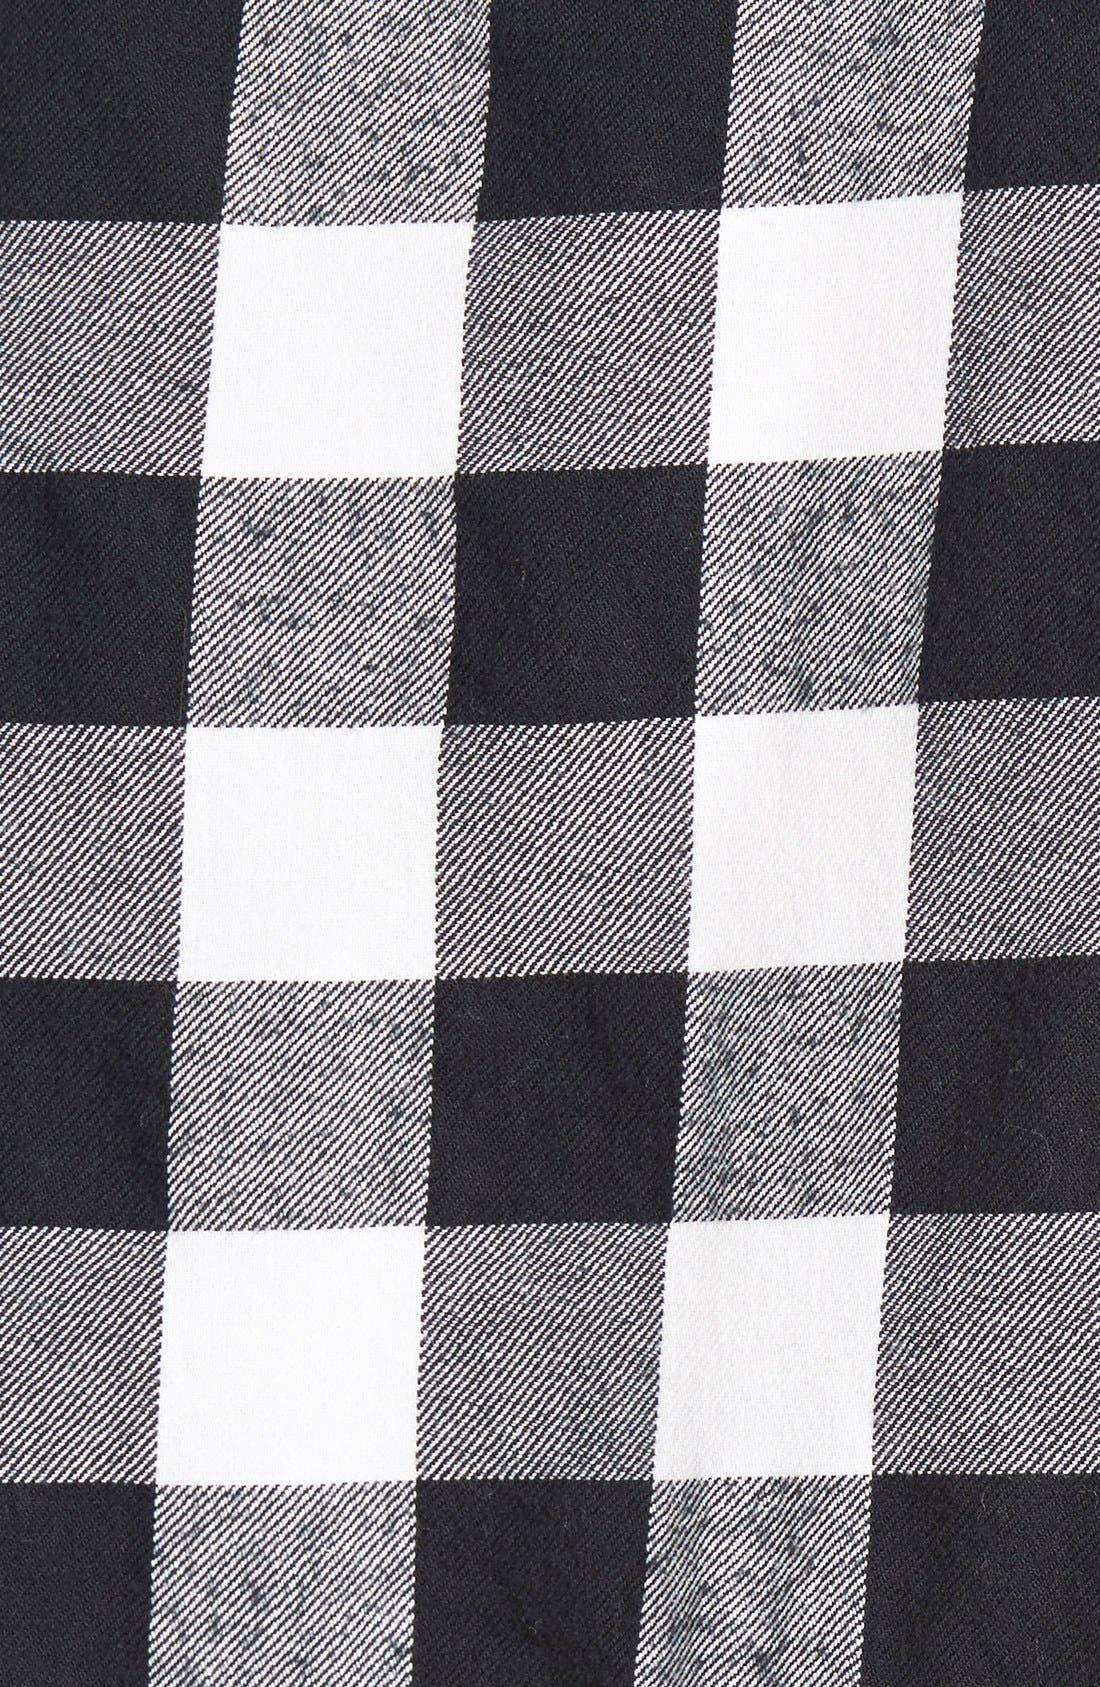 Plaid Boyfriend Shirt,                             Alternate thumbnail 2, color,                             001